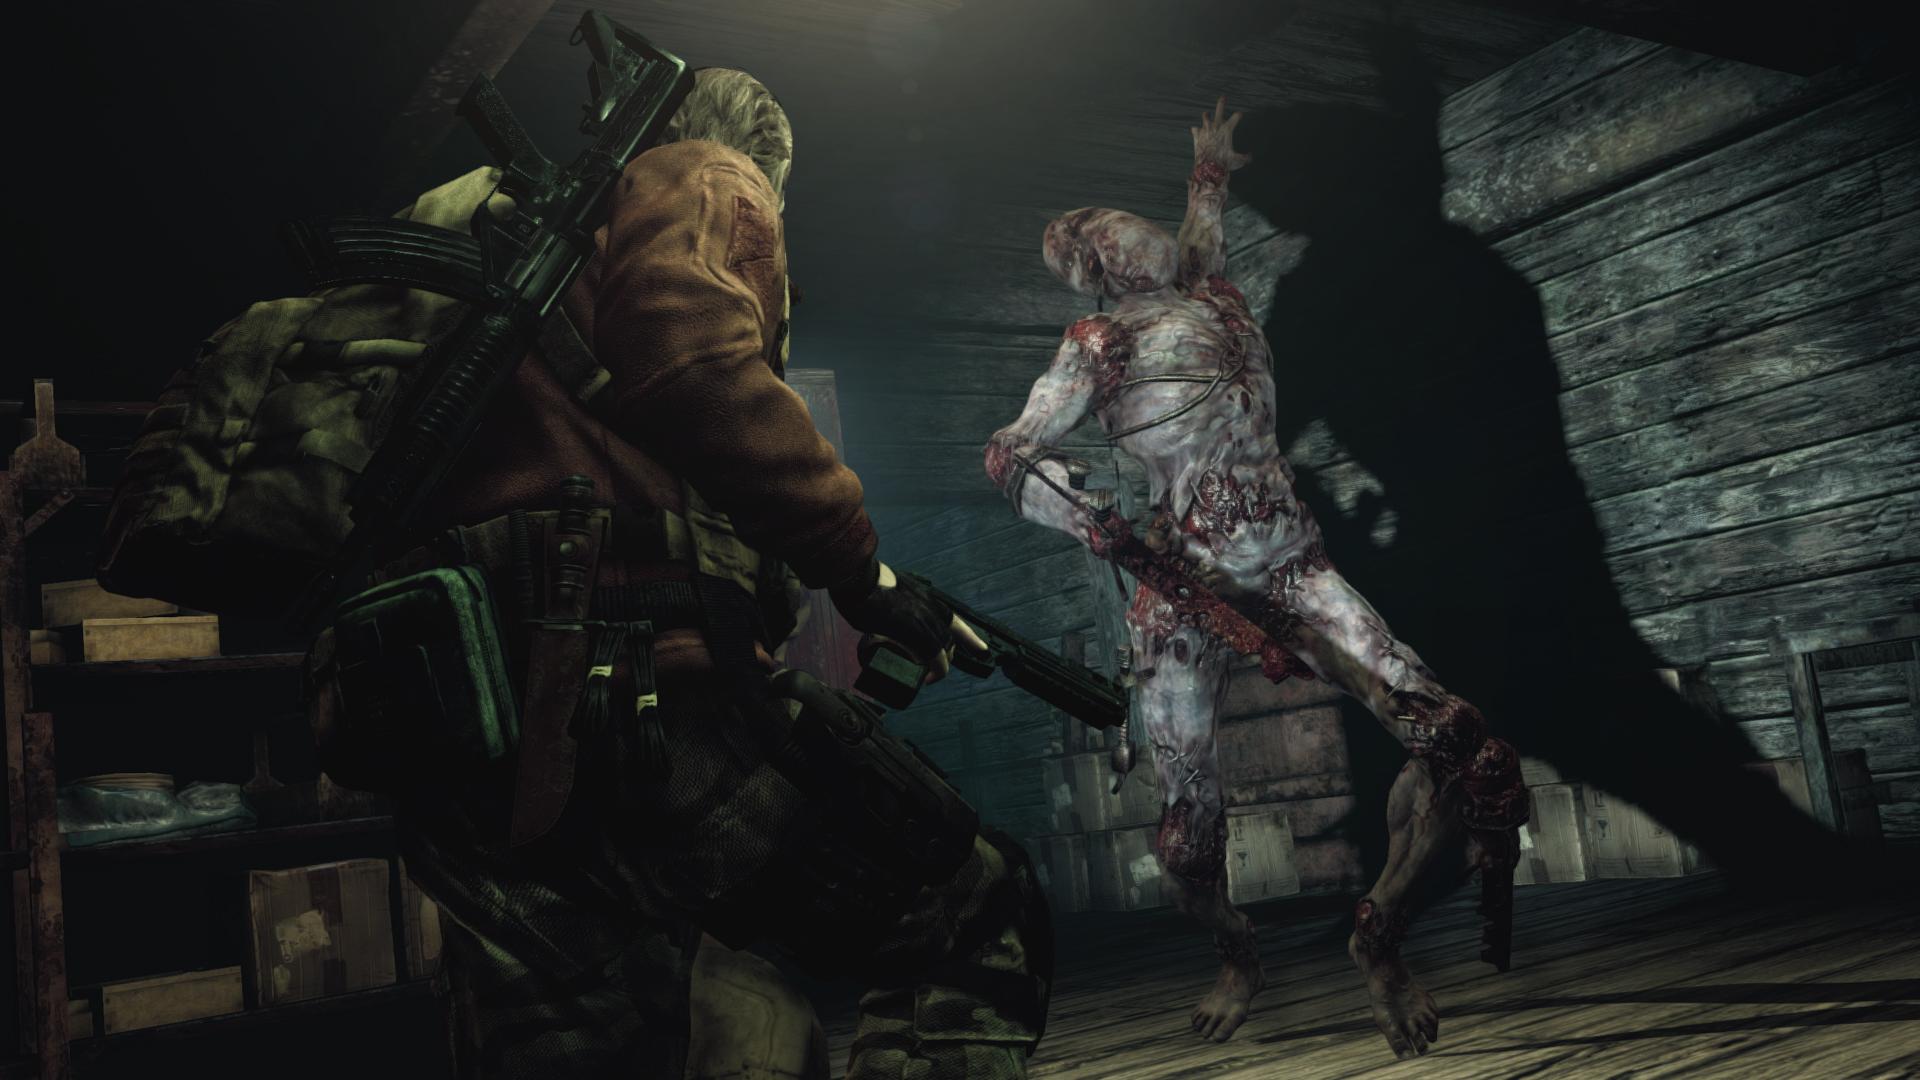 Resident Evil Revelations 2 ESPAÑOL PC Full + Update 2.1 (CODEX) + REPACK 3 DVD5 (JPW) 8